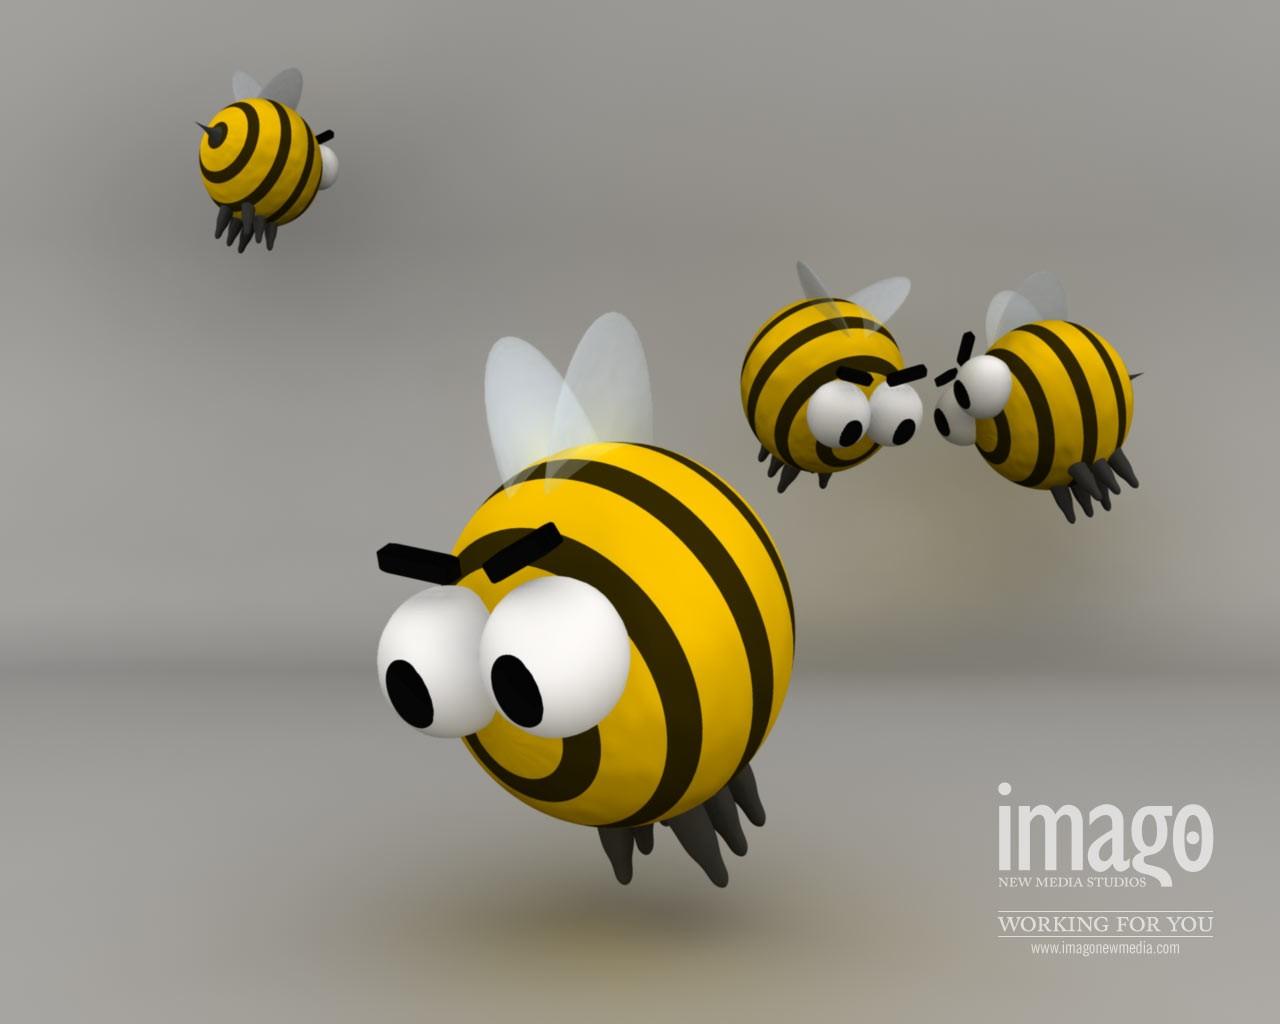 Veryfunnywallpaper Funny Cartoon Animations 31 Free Hd